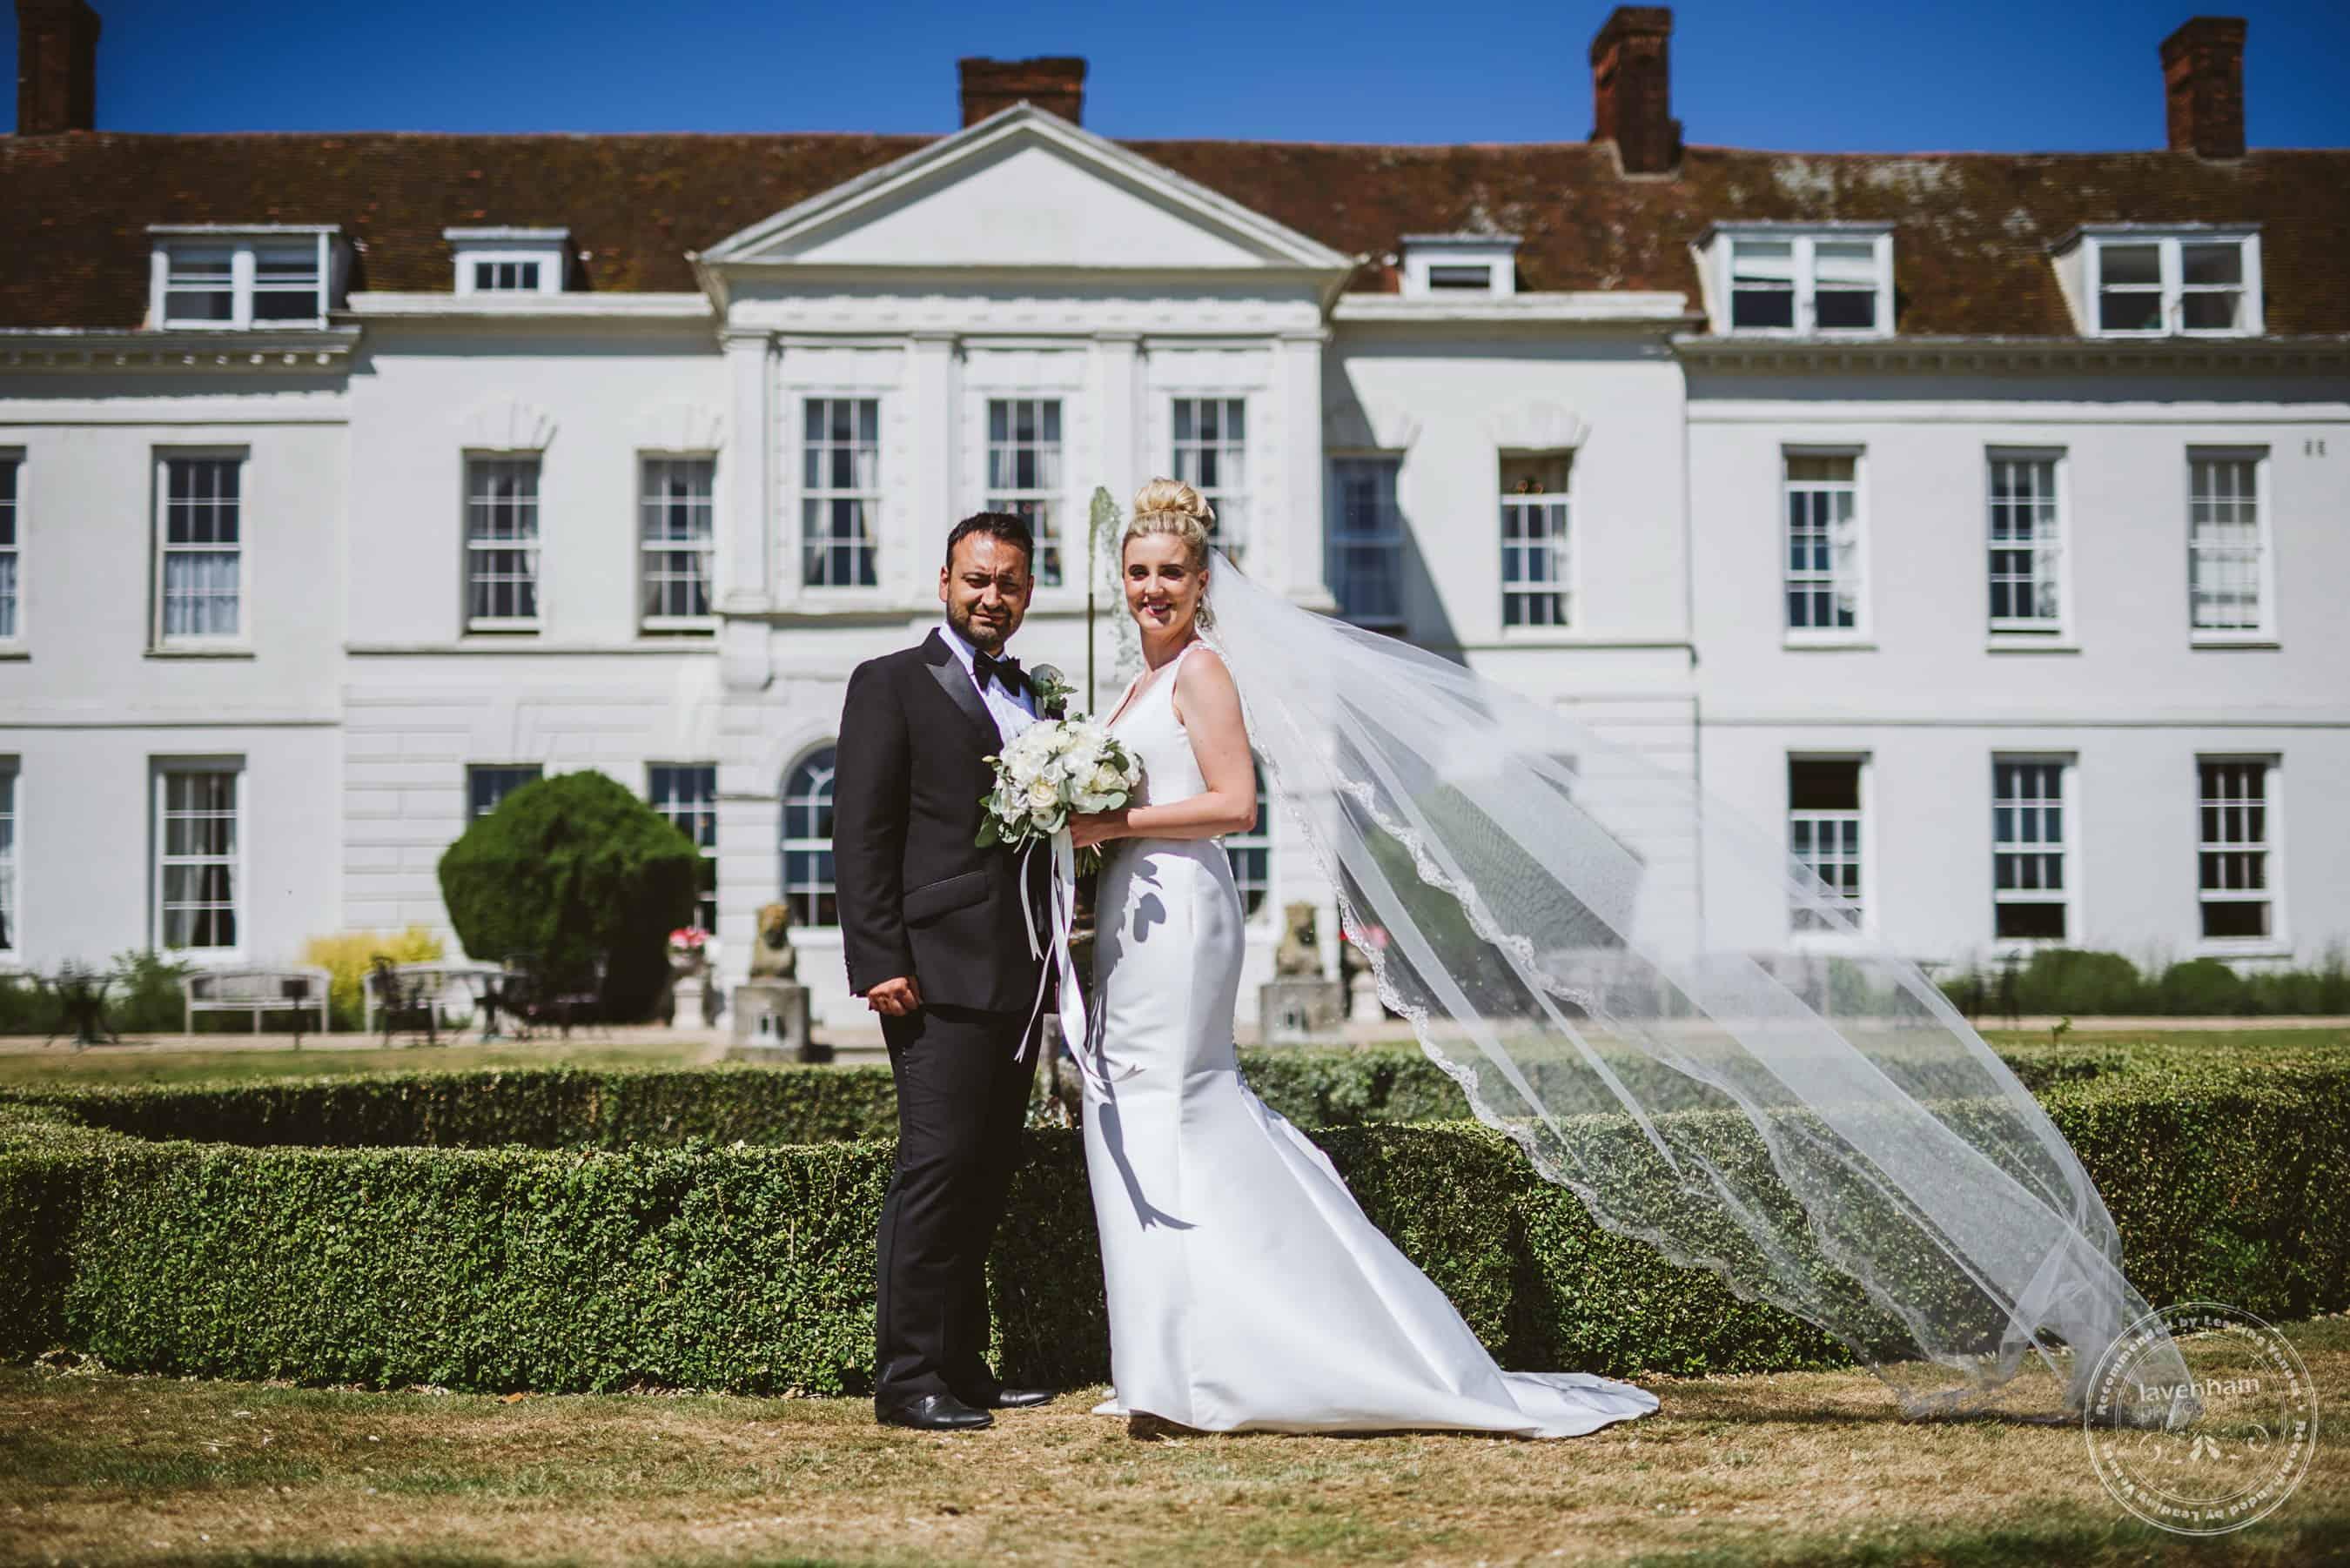 220618 Gosfield Hall Wedding Photography Lavenham Photographic 0136